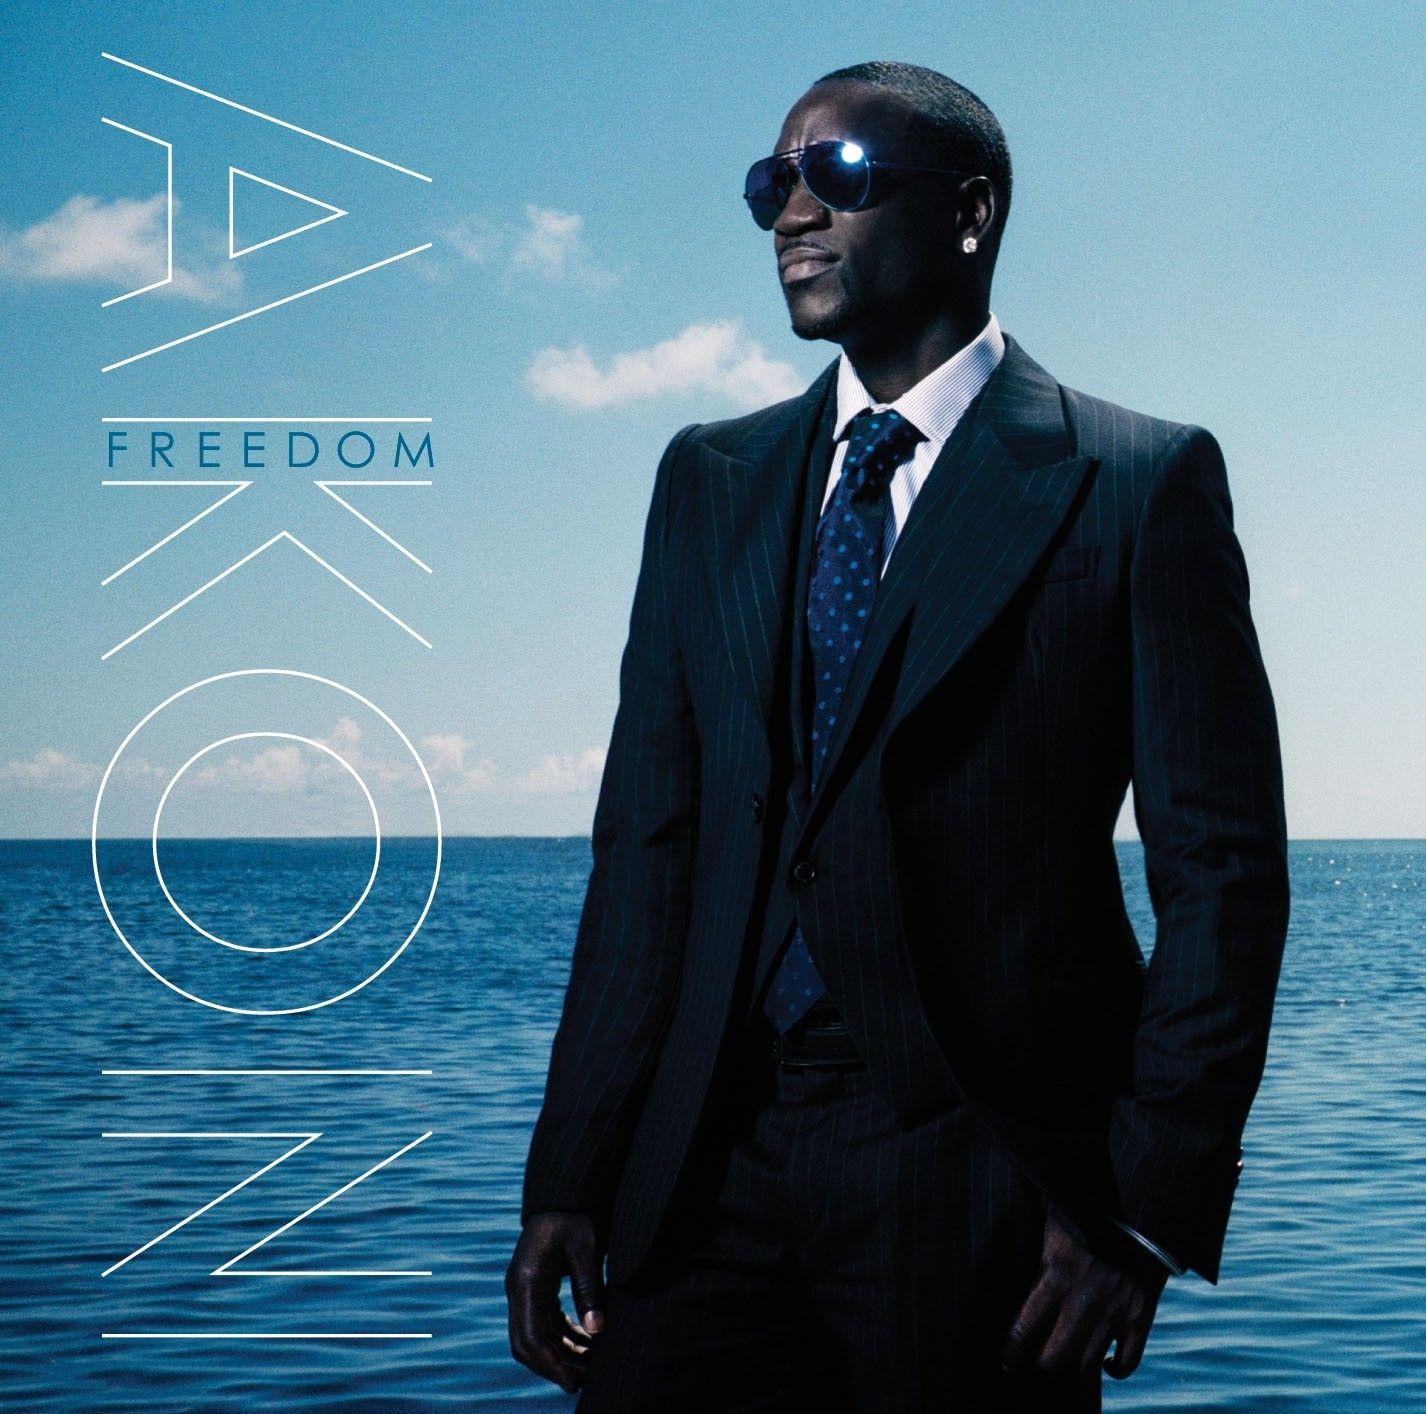 Akon - Freedom album cover